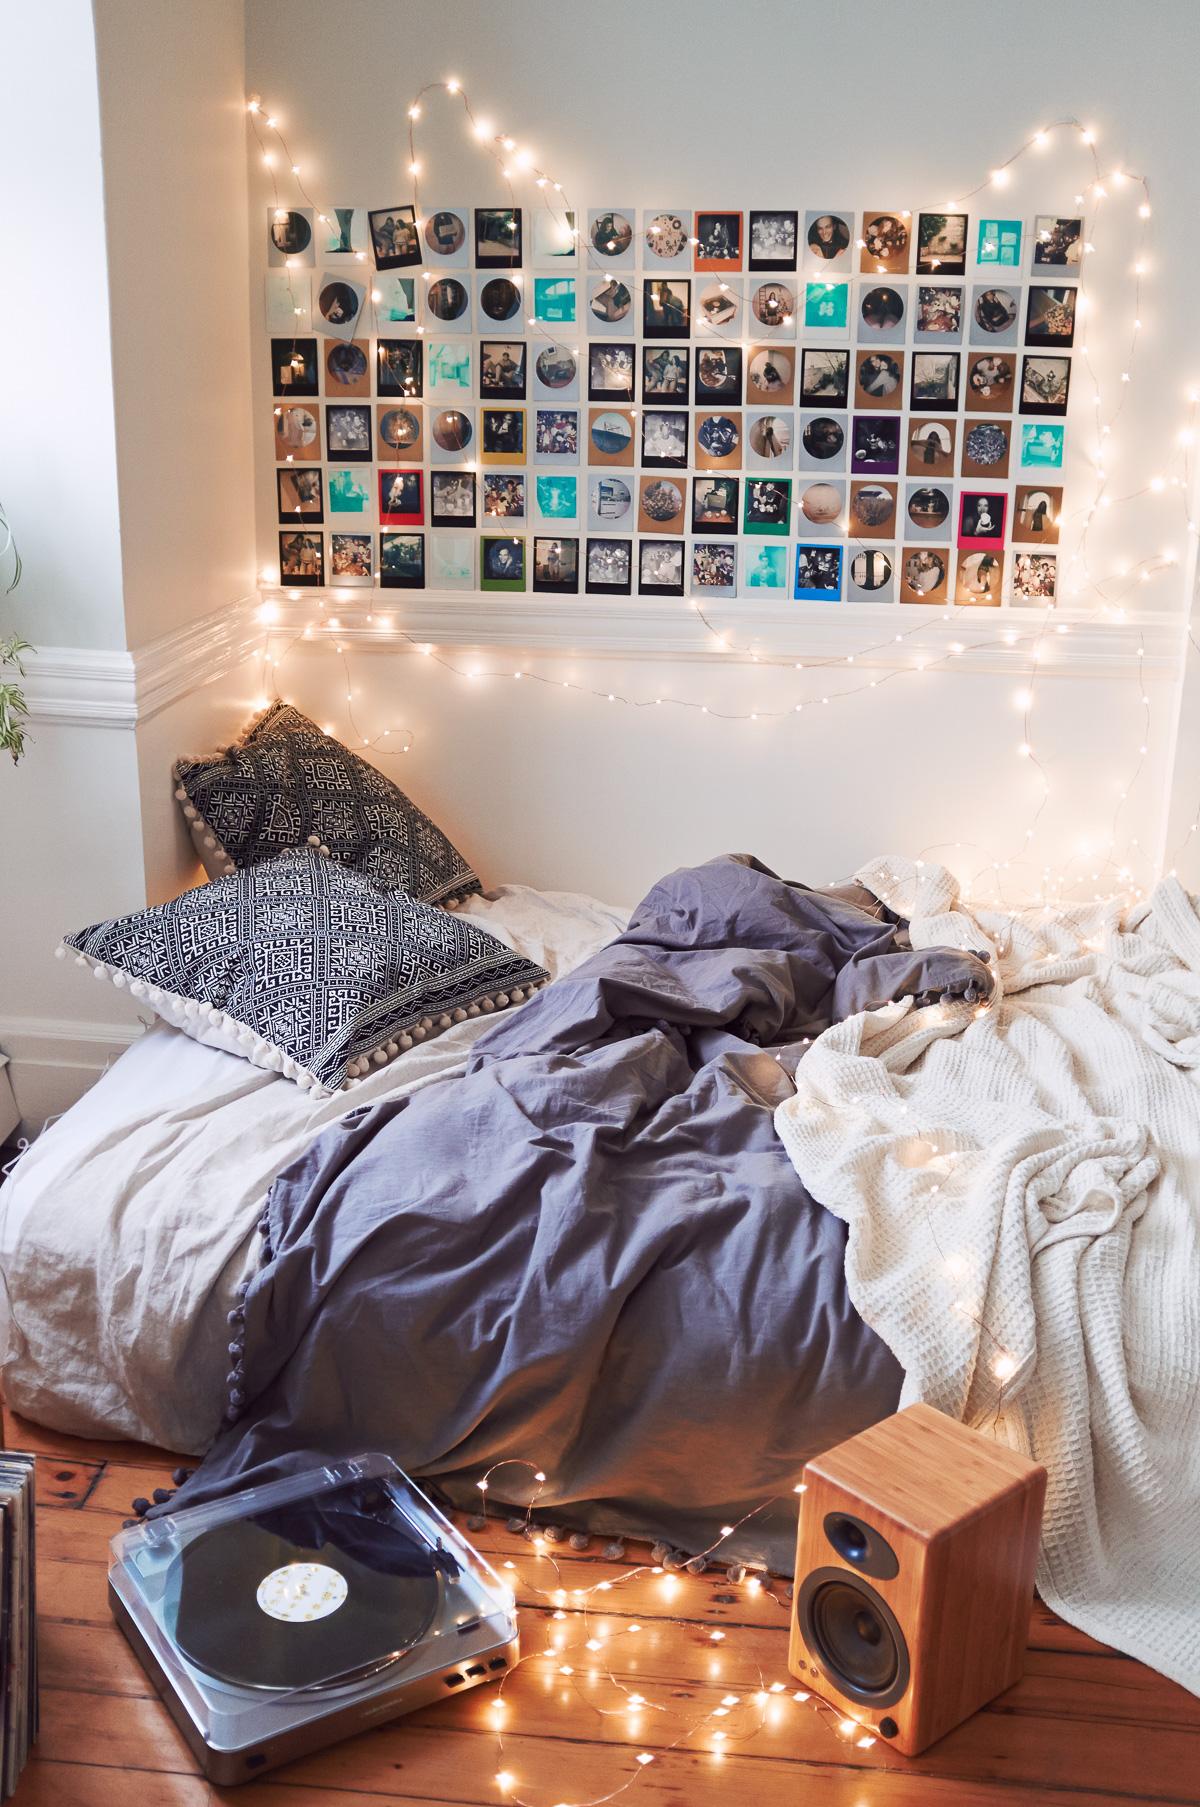 Urban outfitters bedroom - Devyn Galindo